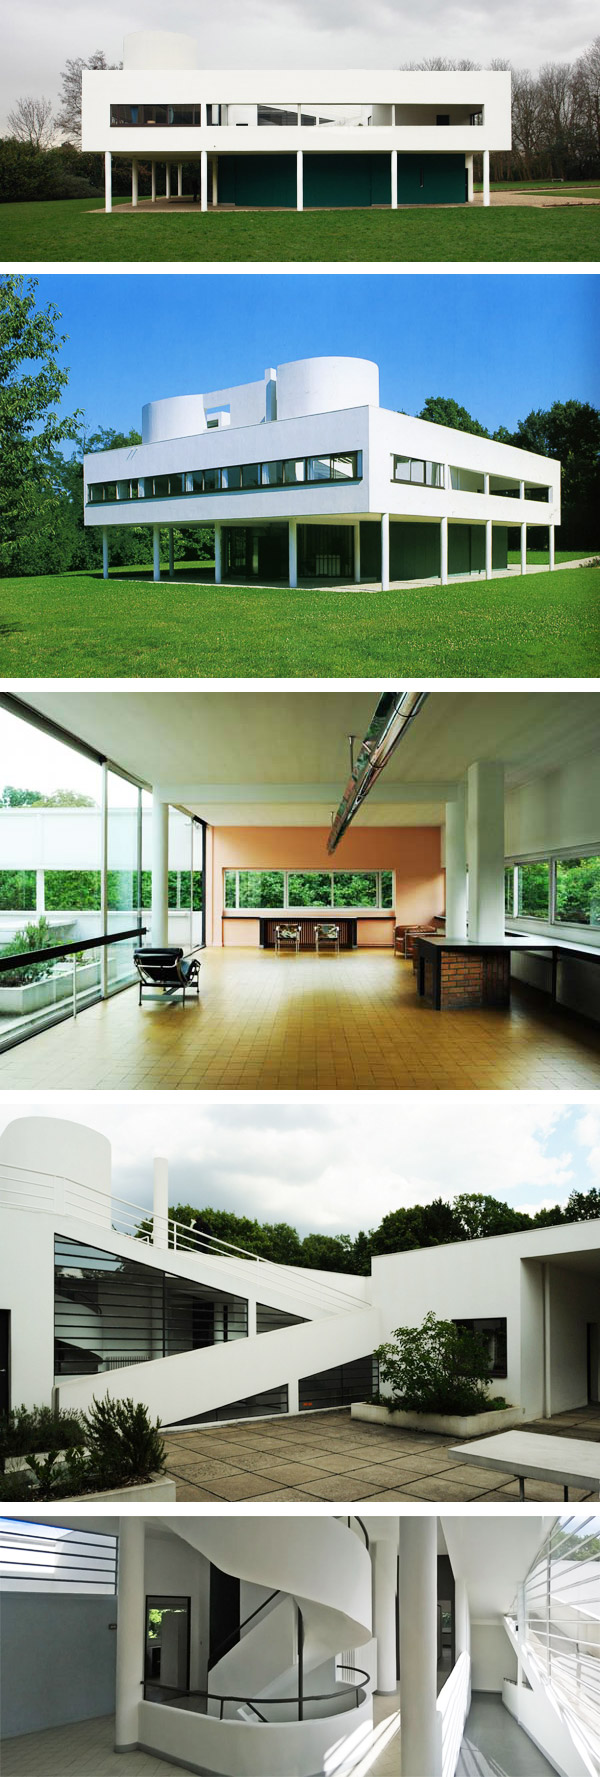 VILLE SAVOYE, Le Corbusier